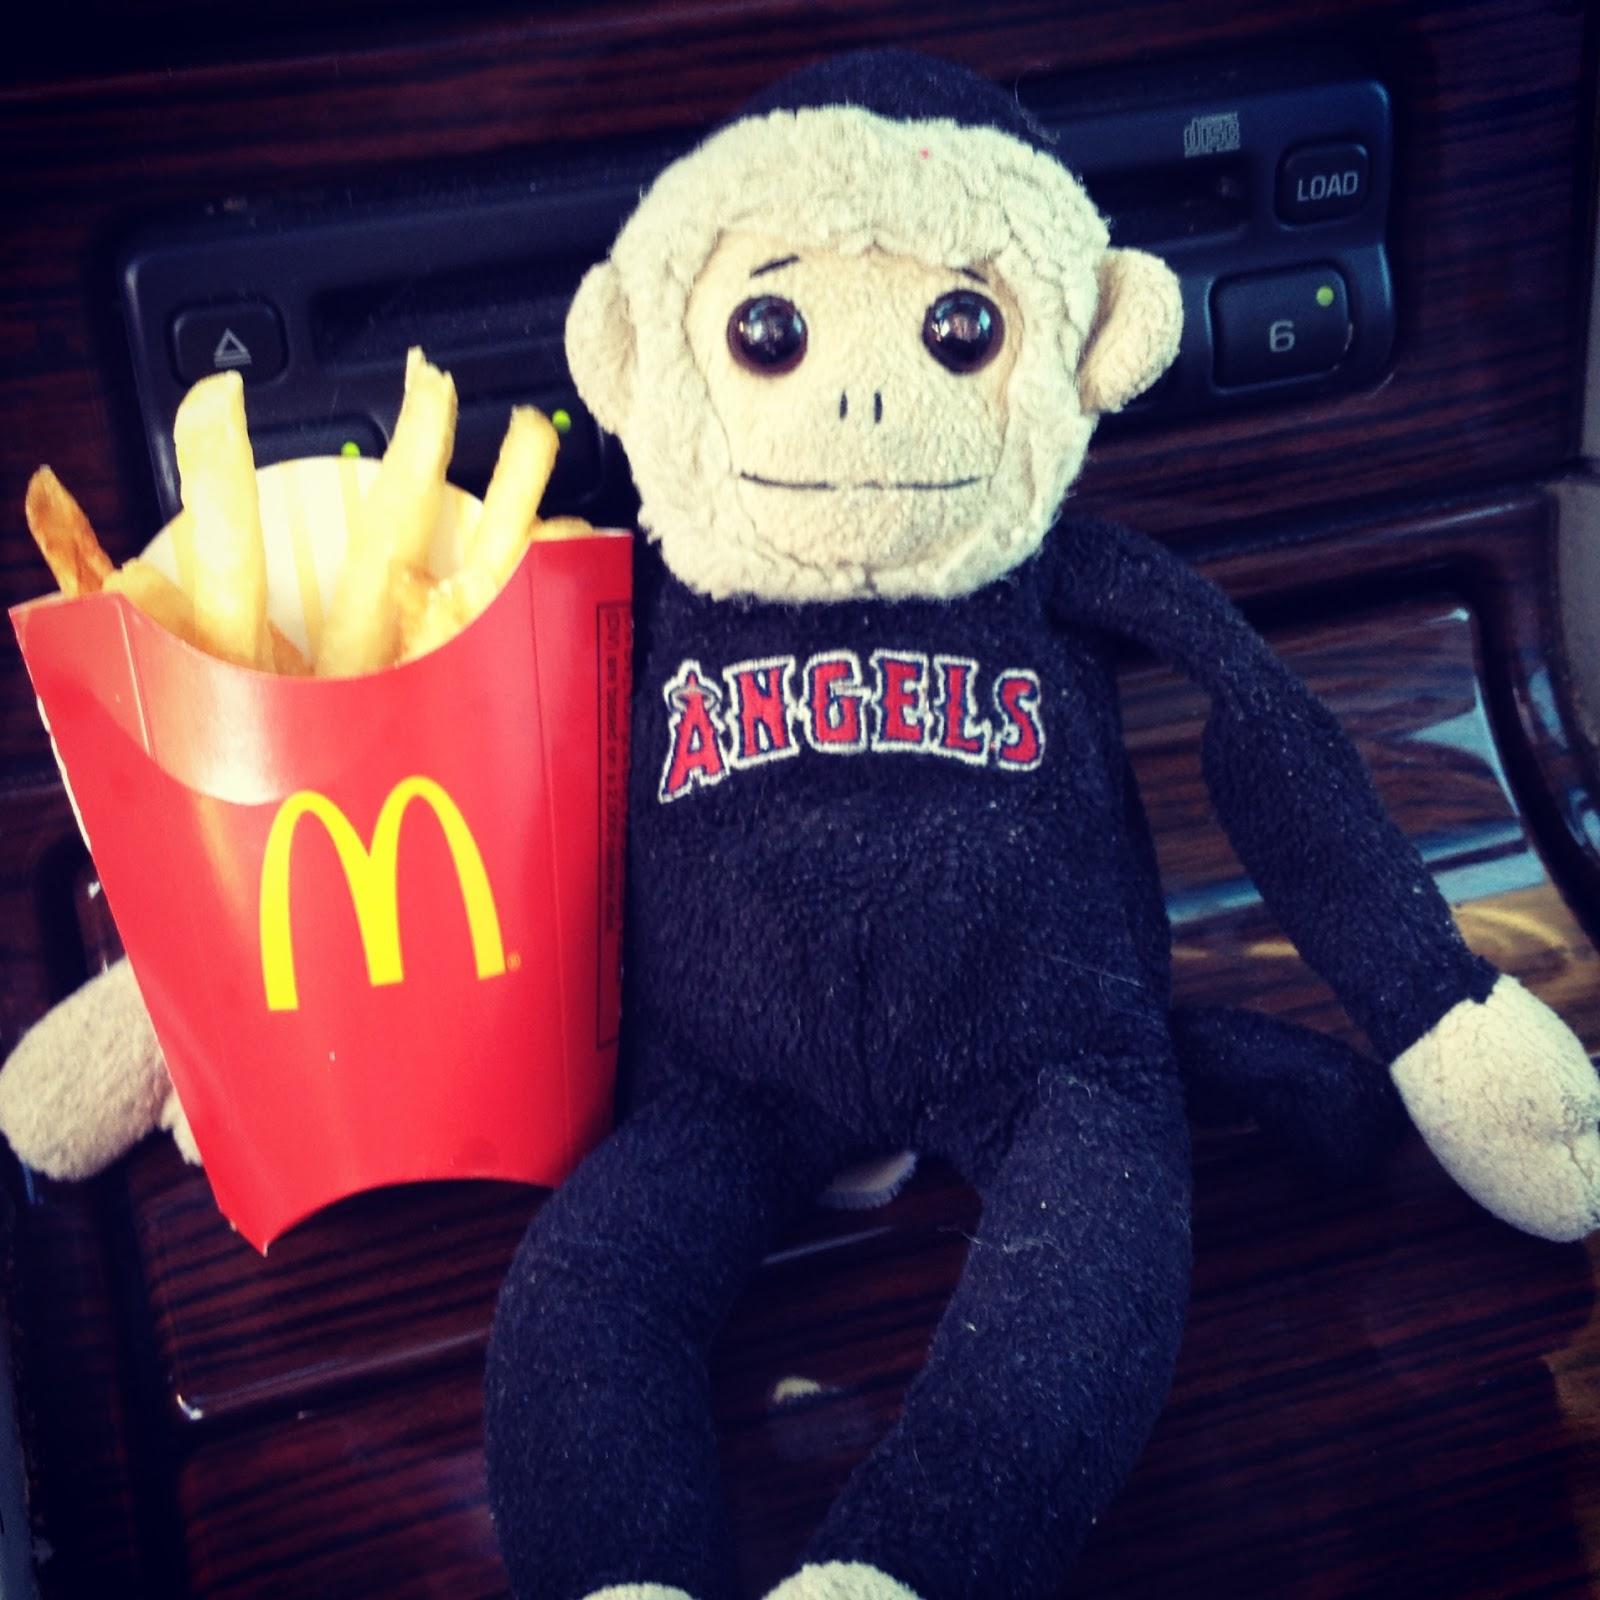 tuna, tuna the monkey, mcdonalds, french fries, kids meal, beanie baby, rally monkey, ty, monkey, angels, angels baseball